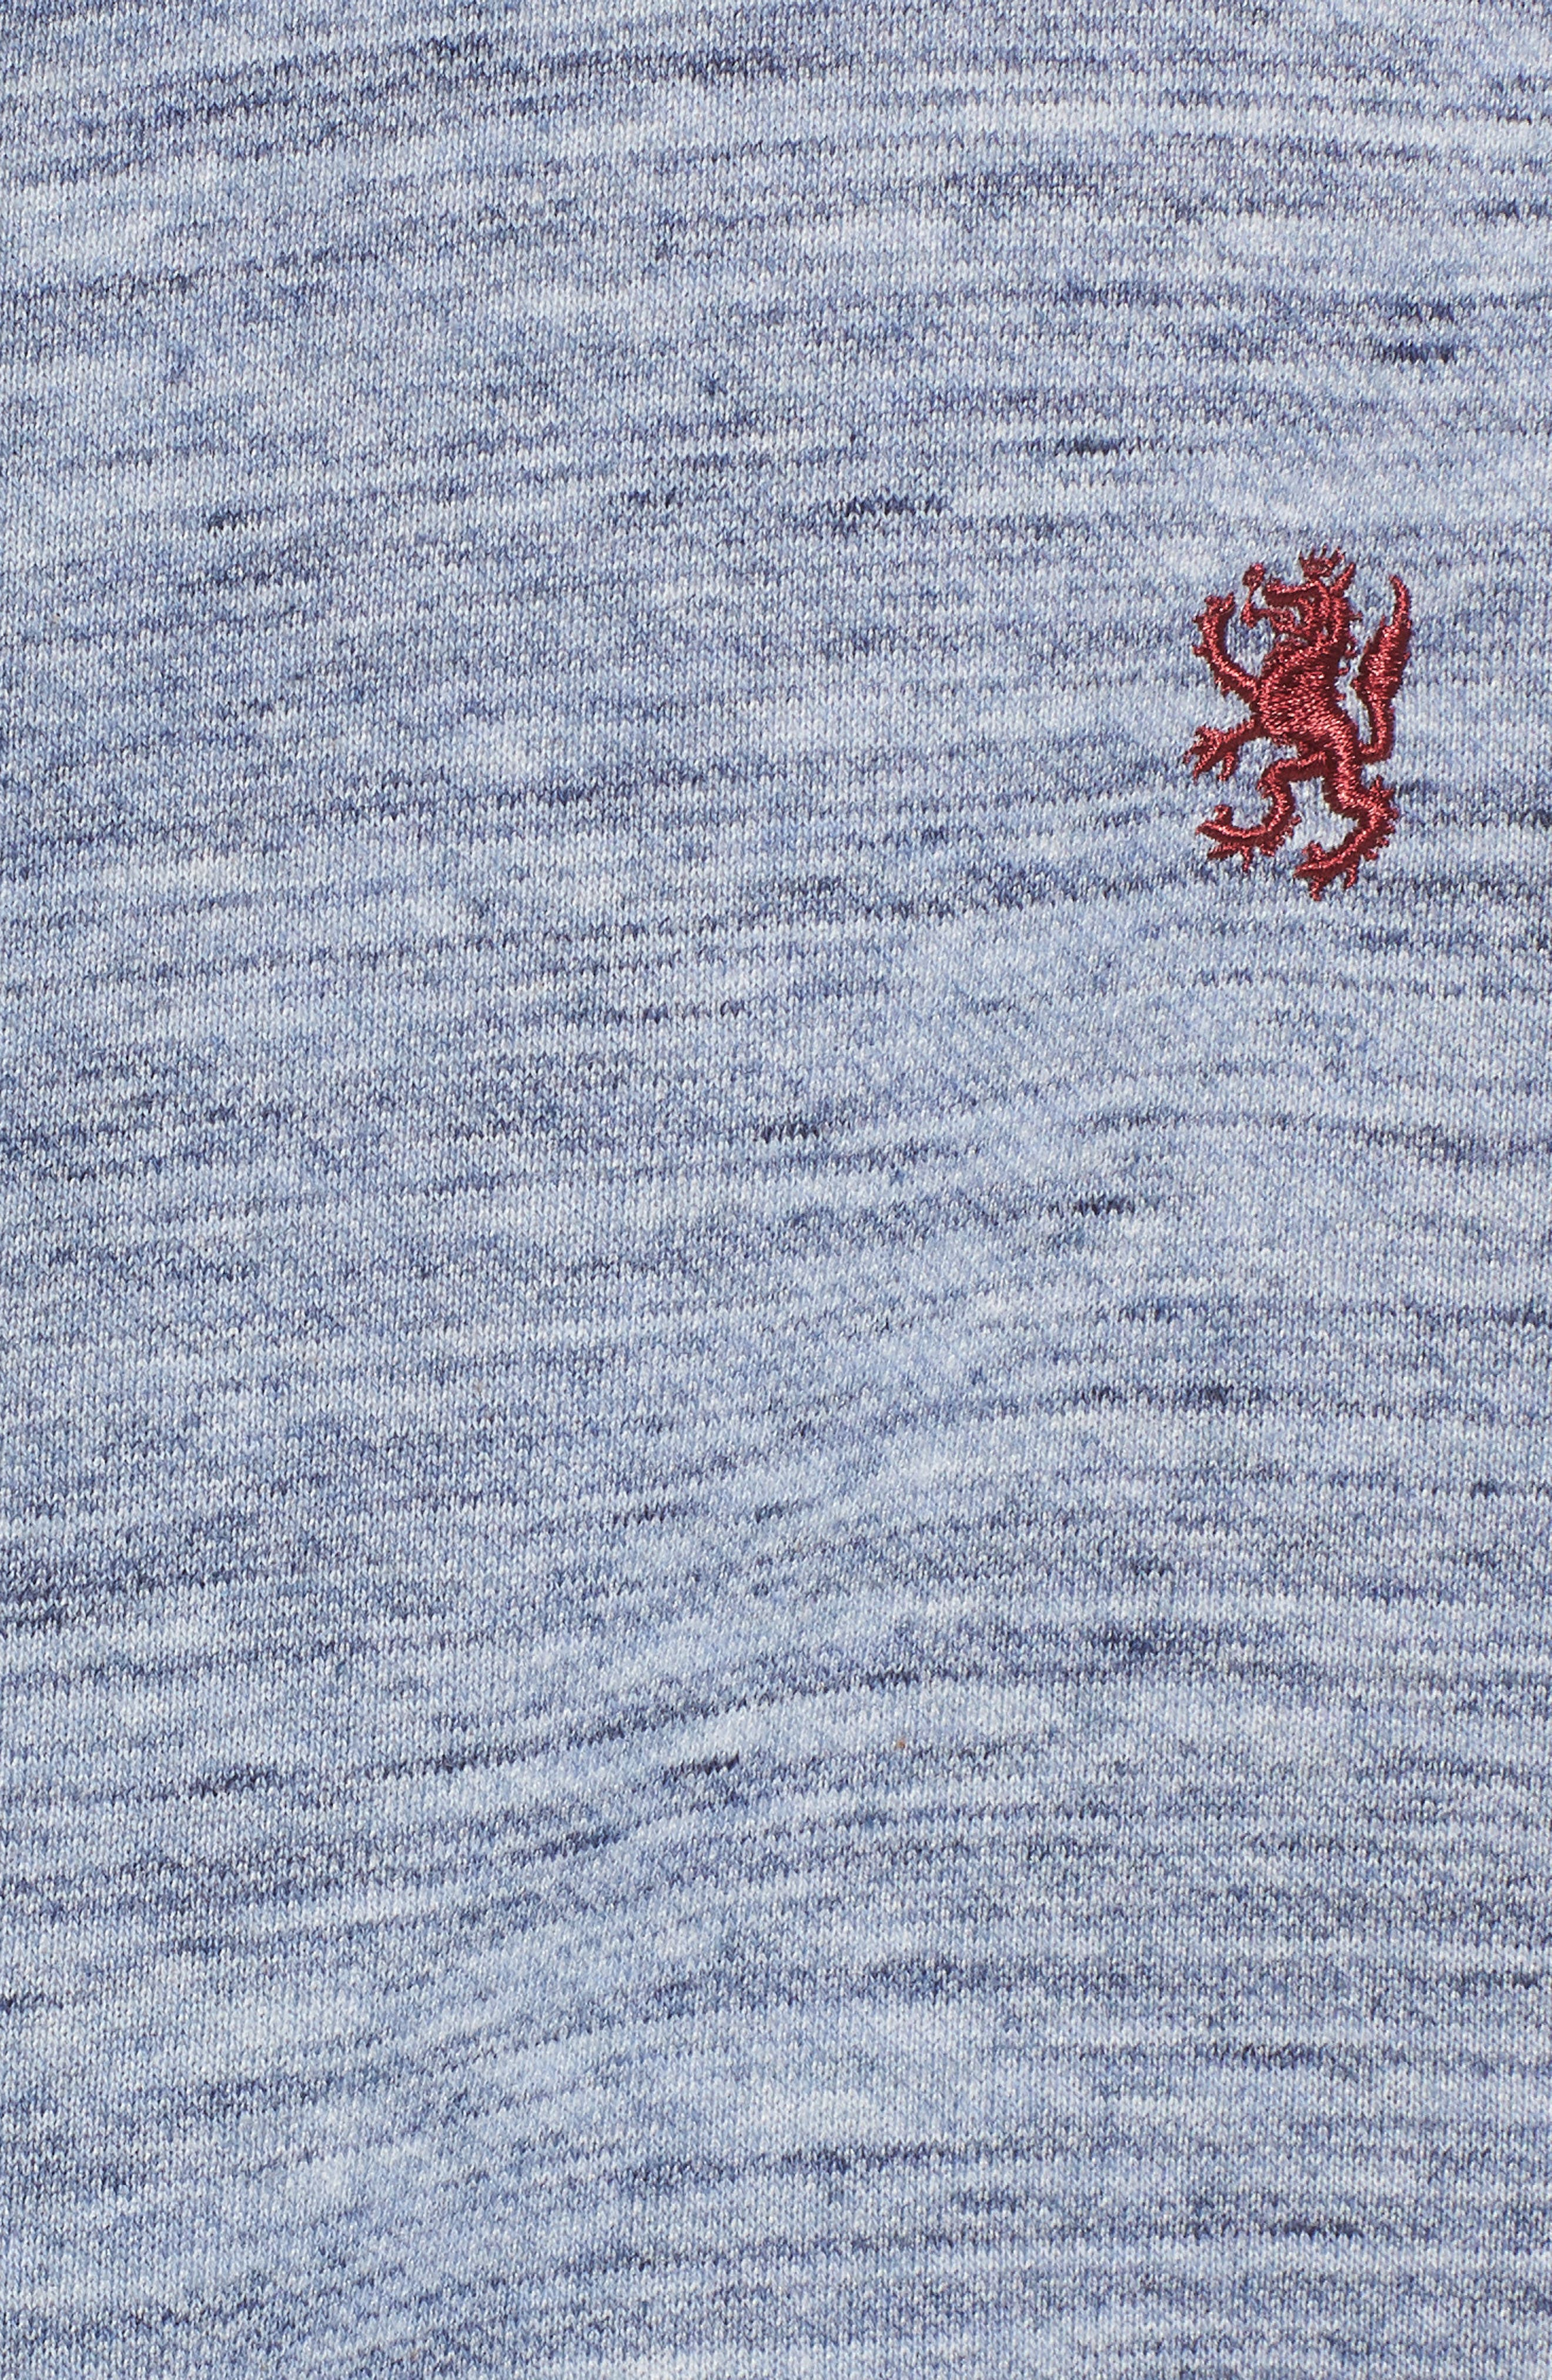 Swept In Waves Robe,                             Alternate thumbnail 5, color,